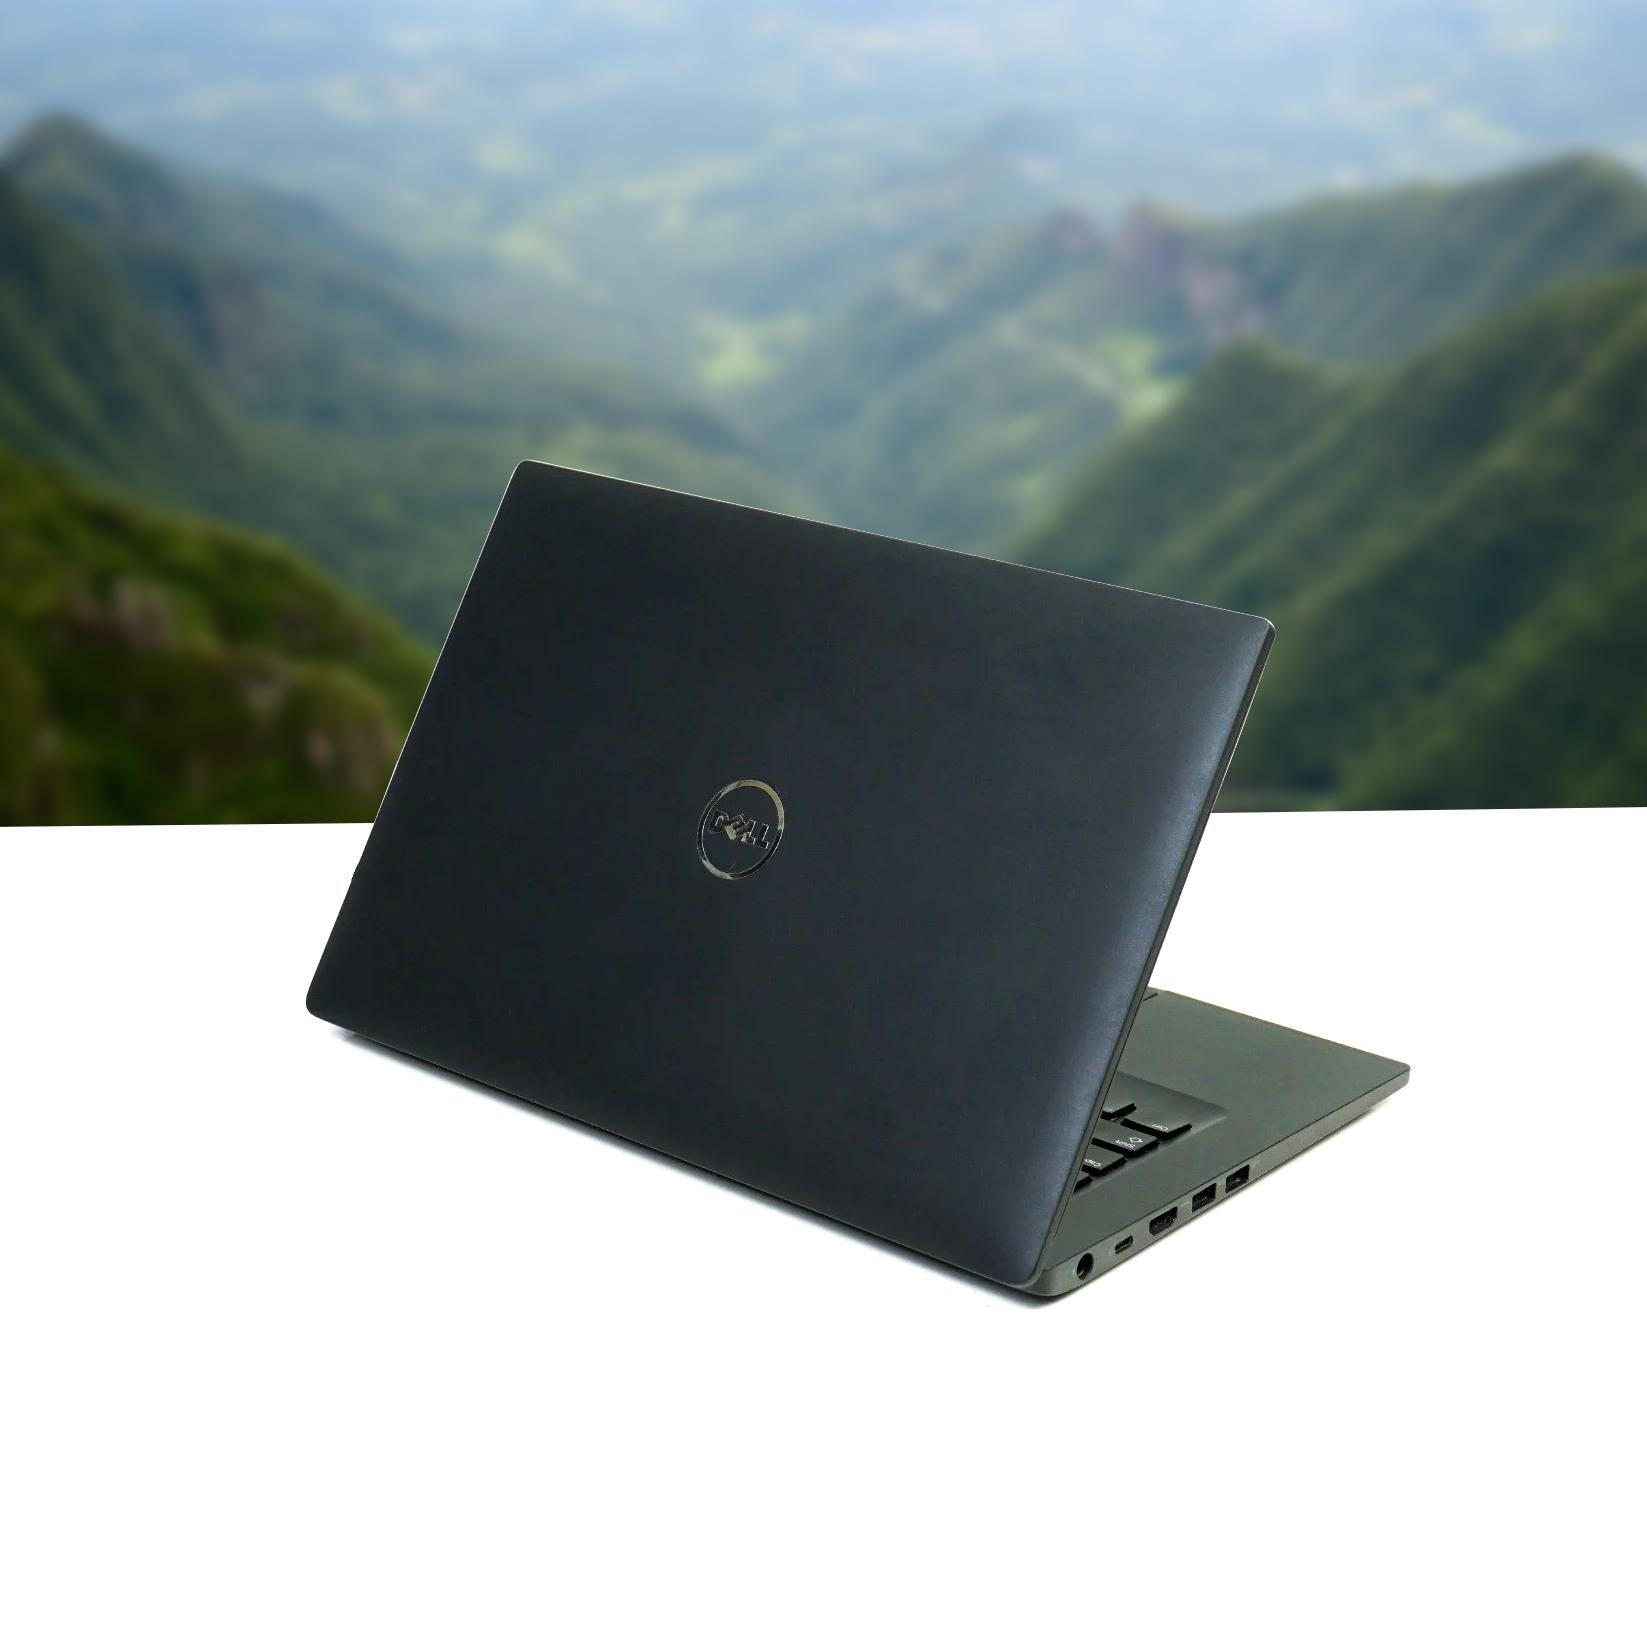 Lenovo S400 Core i5-3317/Ram 4GB/HDD 320GB/ VGA rời